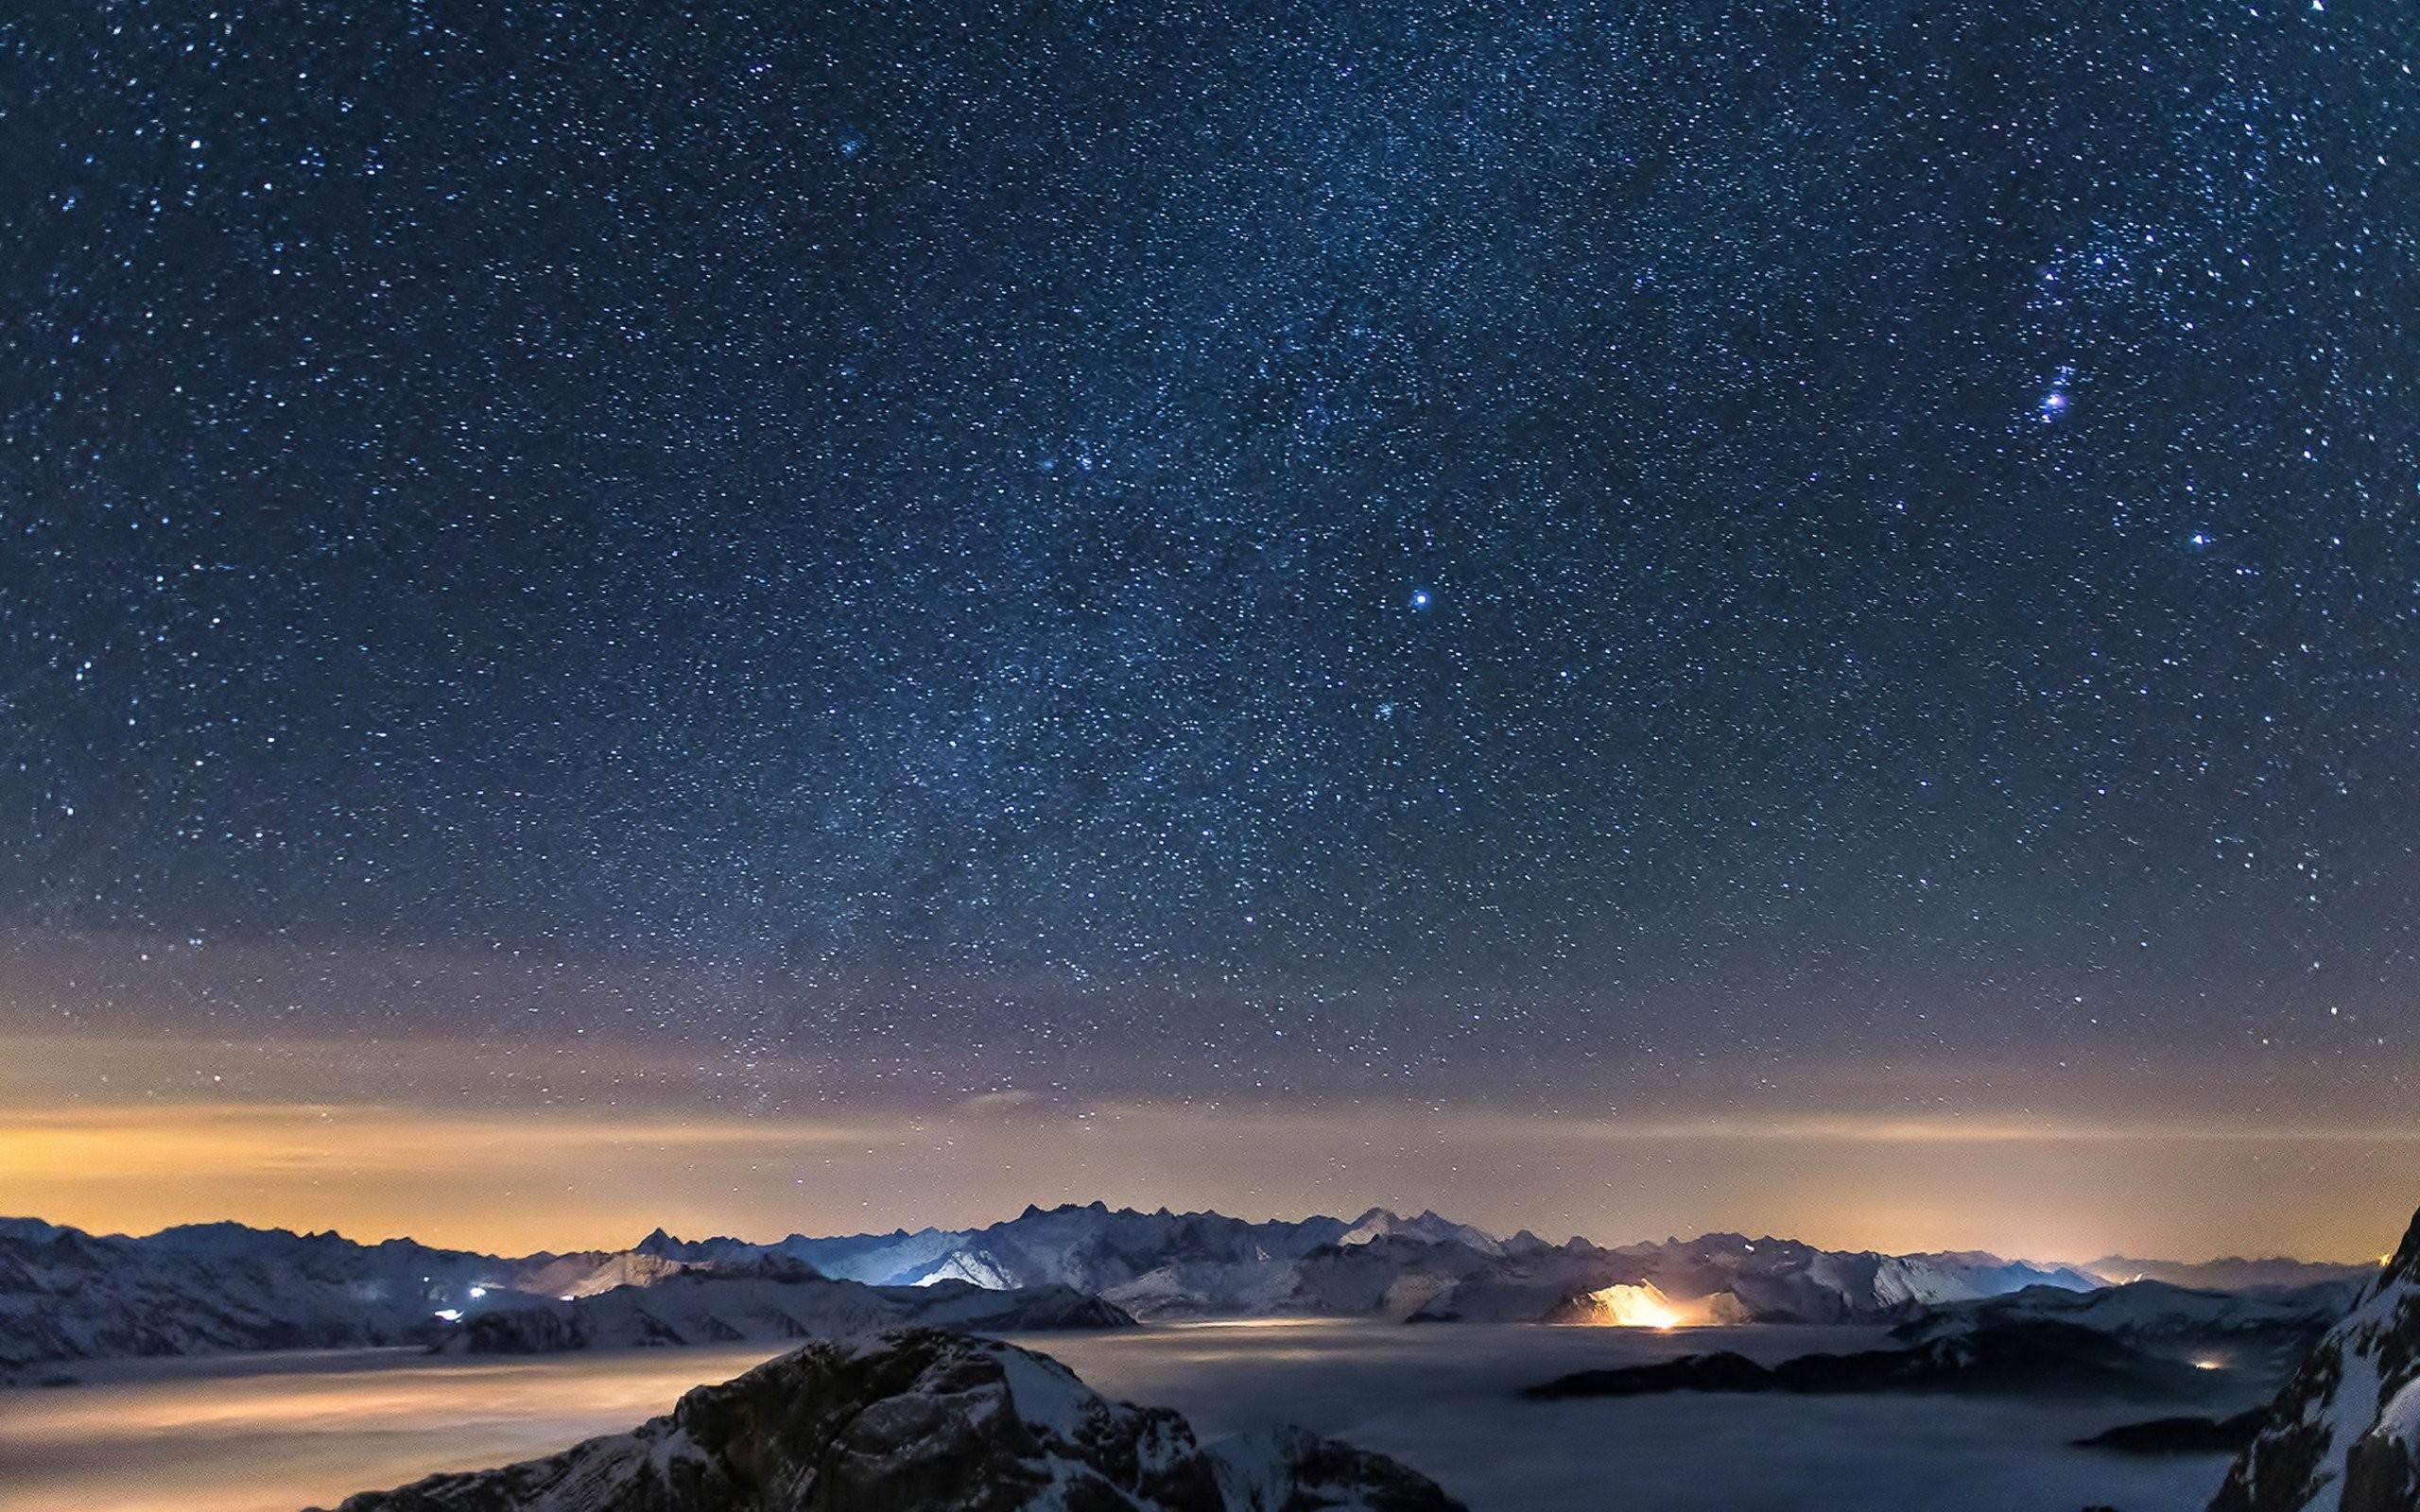 nature mountain galaxy night landscape fog stars ultrahd 4k wallpaper .